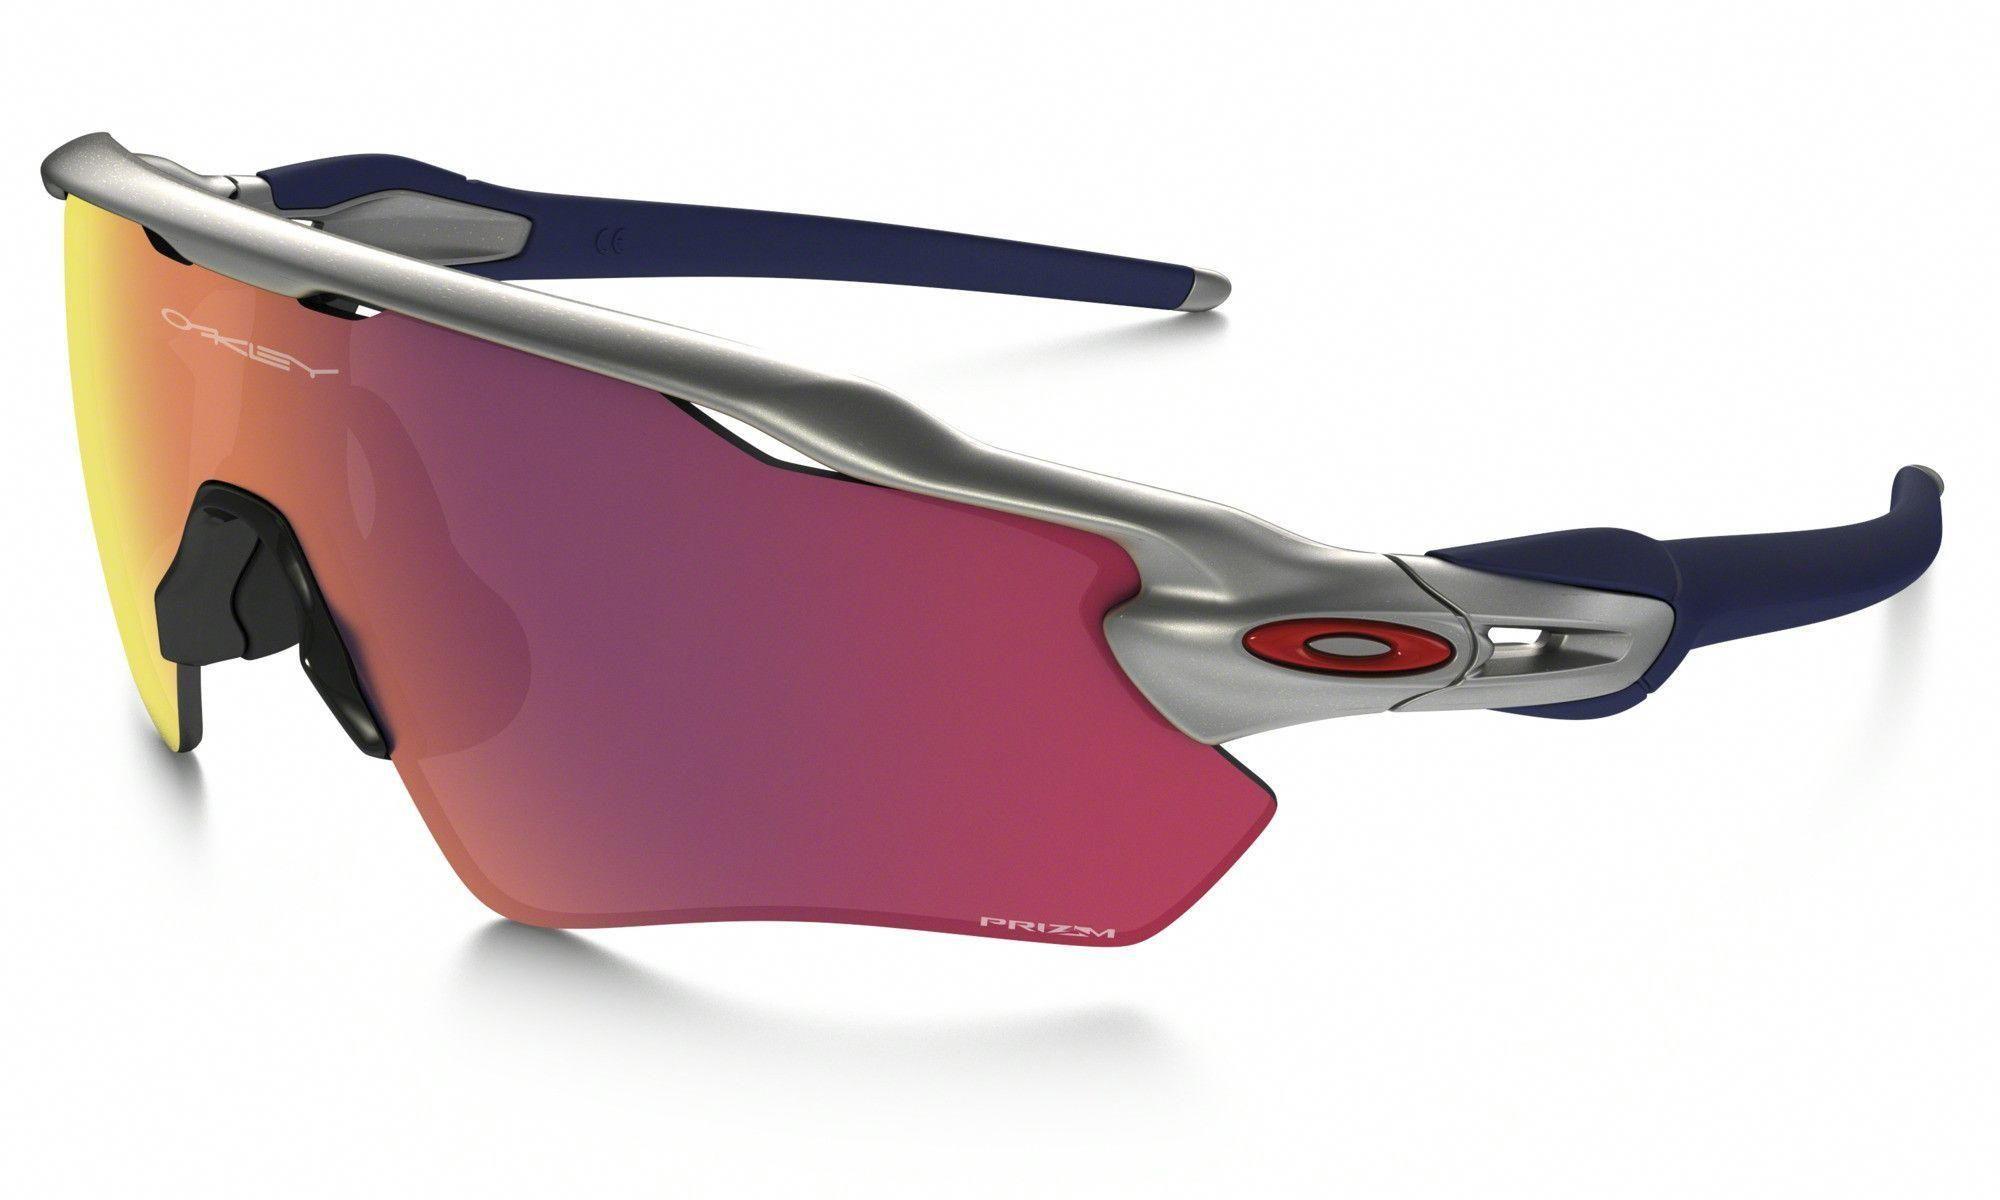 Oakley Radar EV Sunglasses baseballsunglasses Baseball